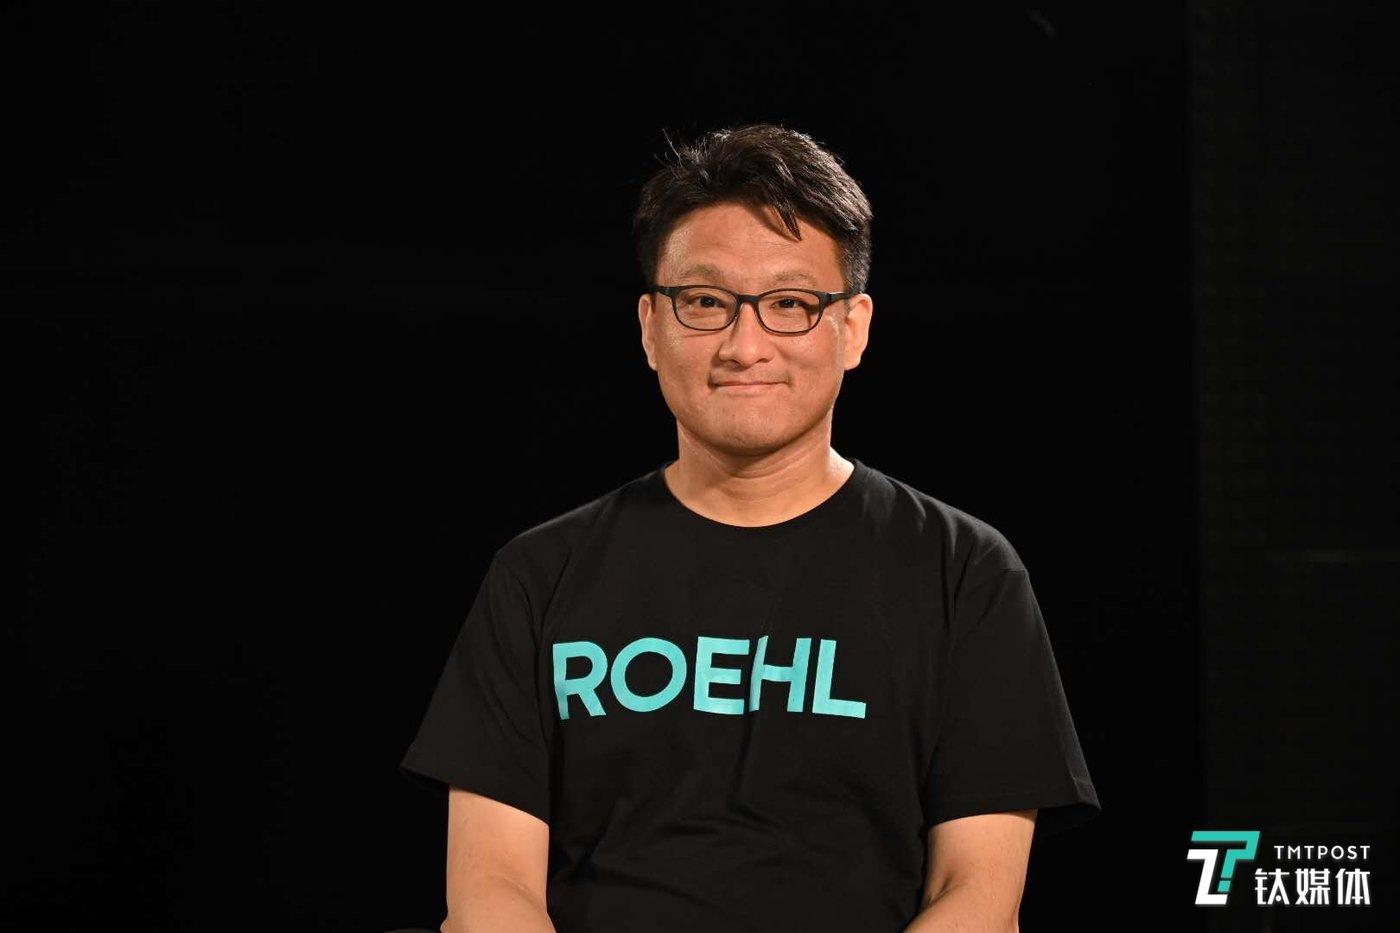 ROEHL创始人兼CEO 叶强生